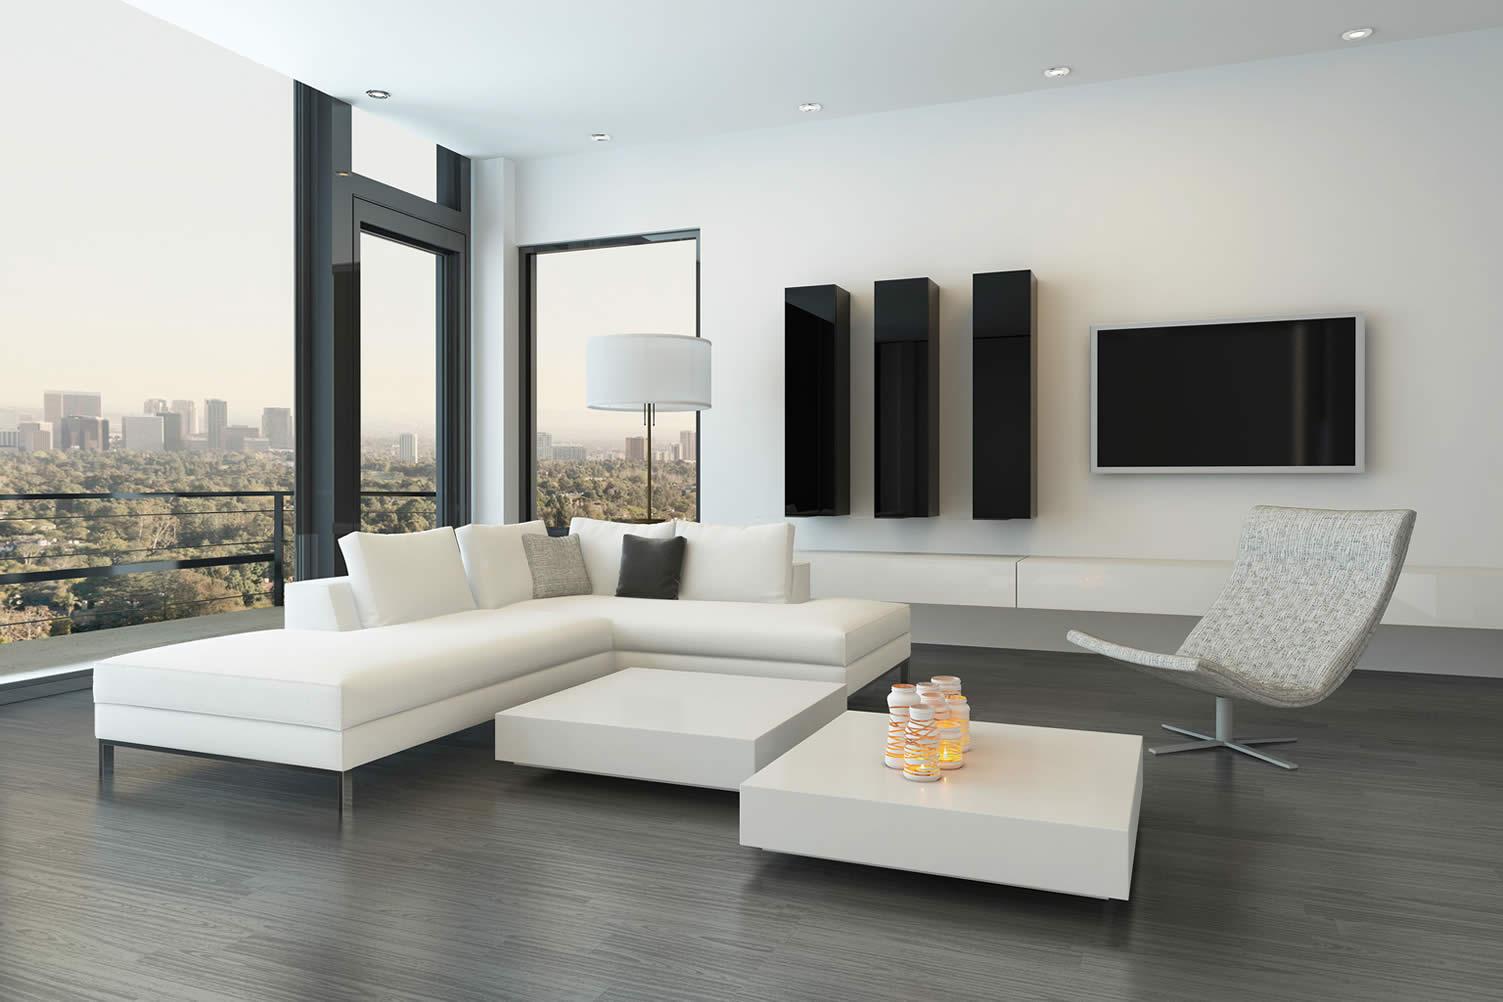 popular furniture styles